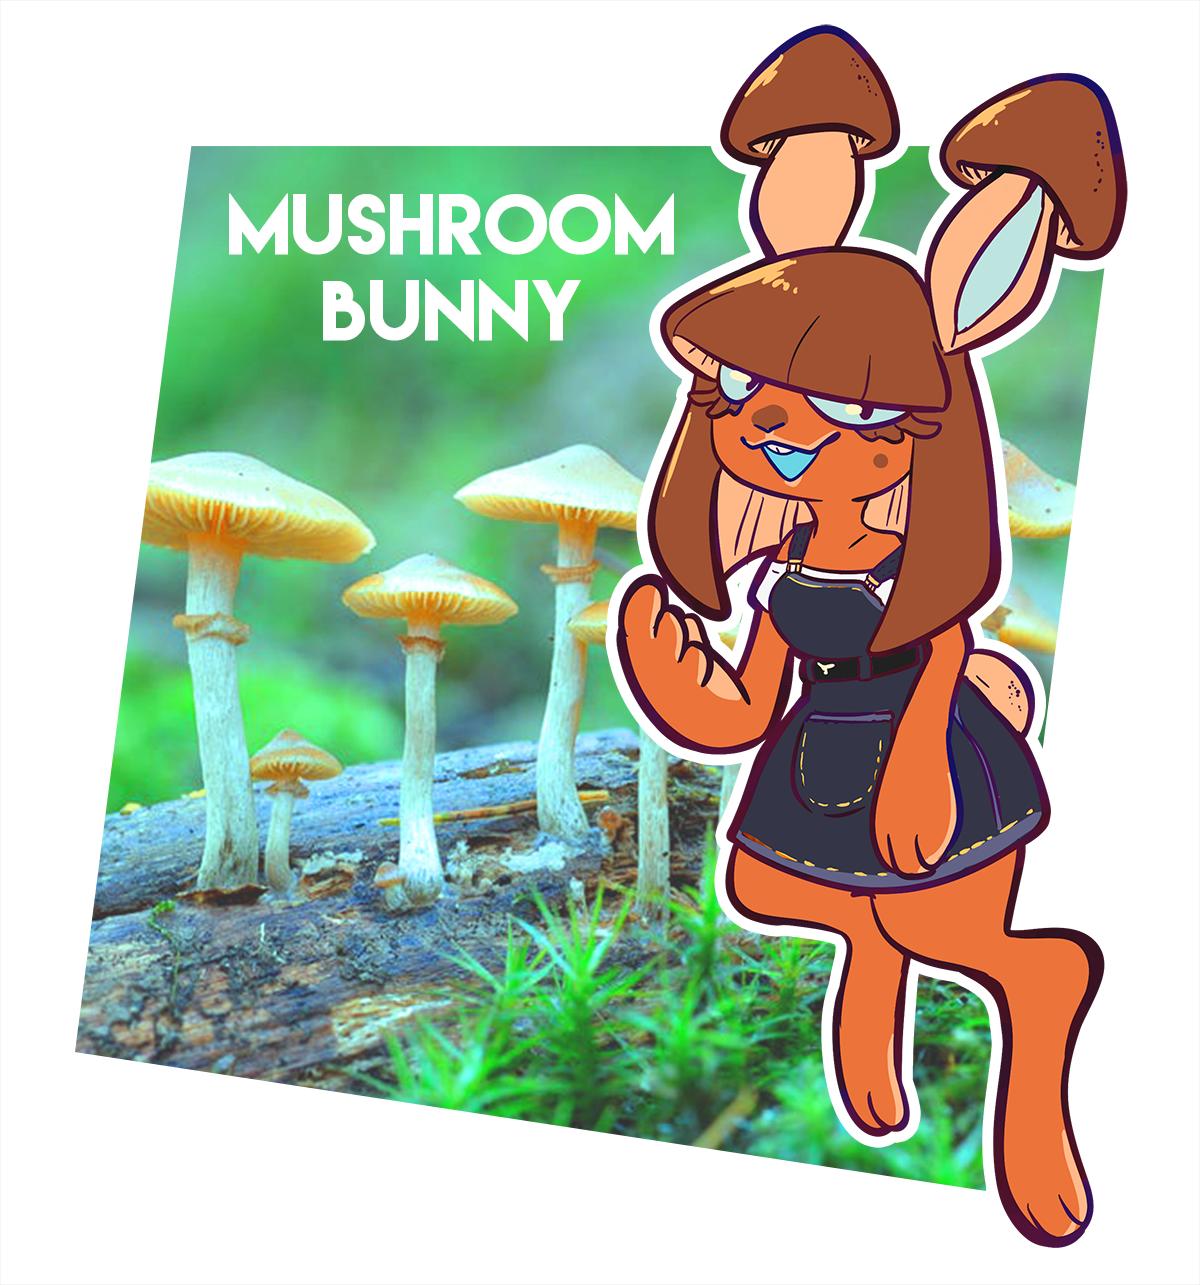 Mushroom Bunny